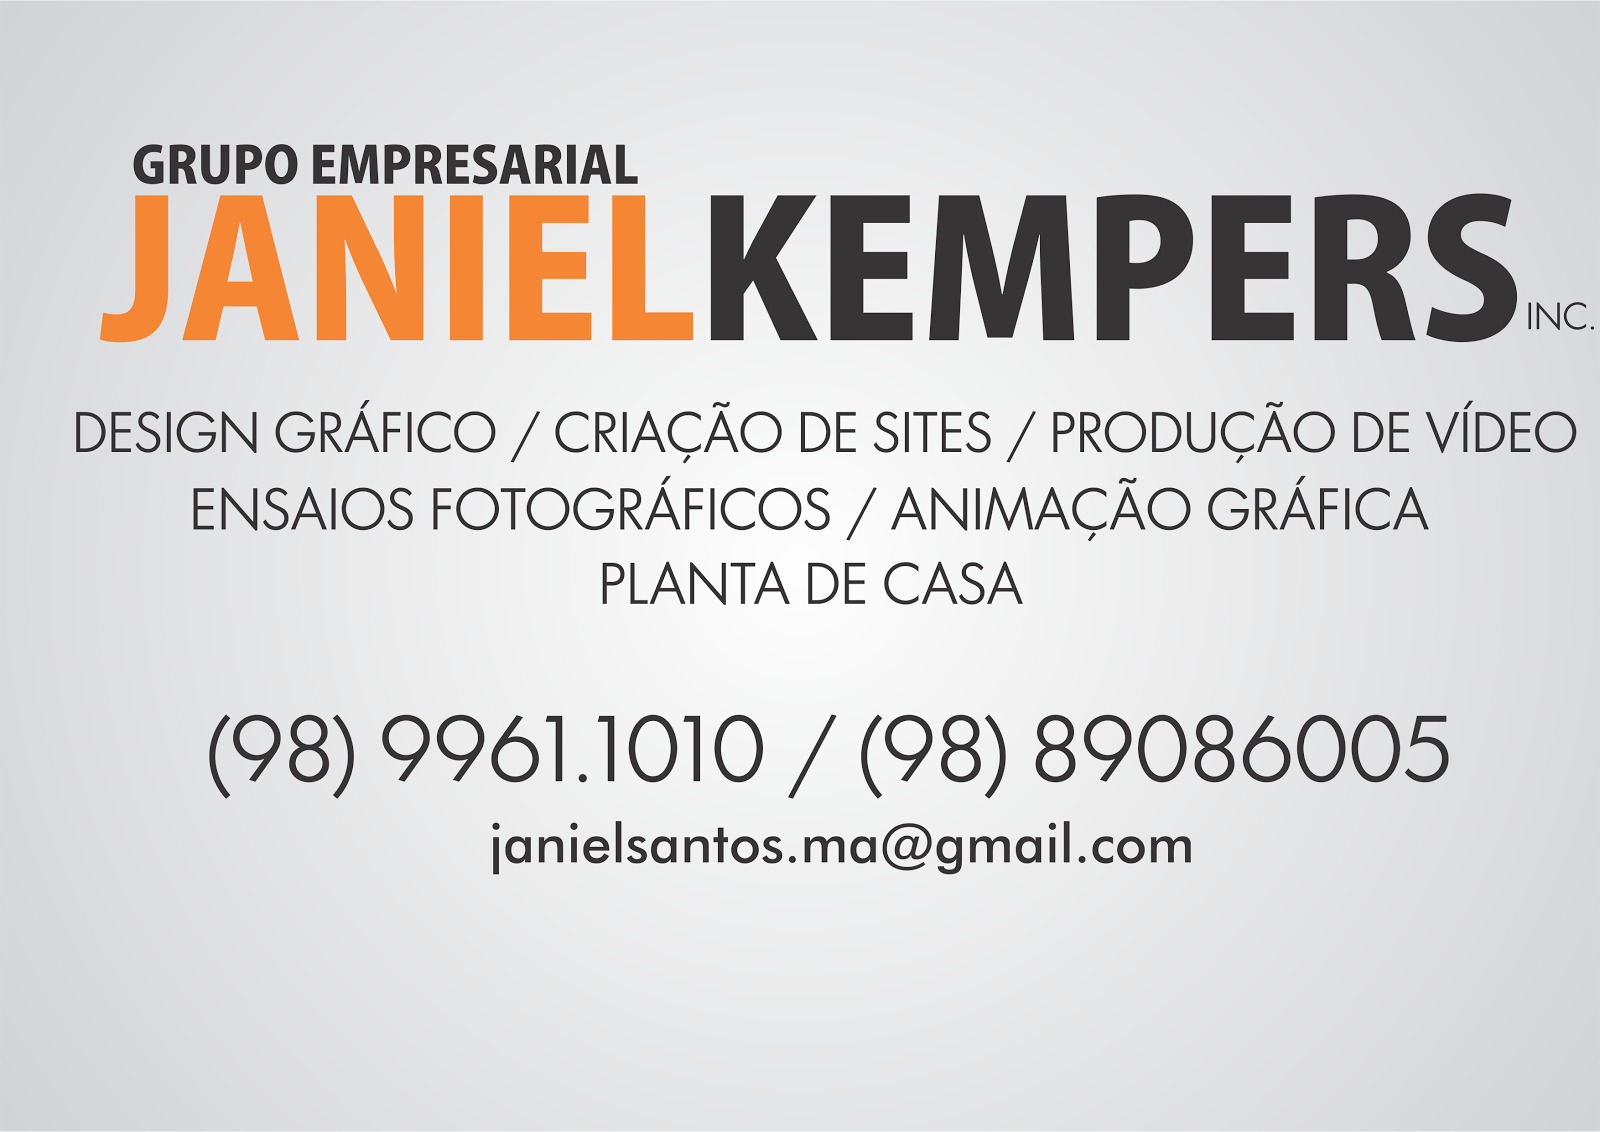 JANIEL KEMPERS